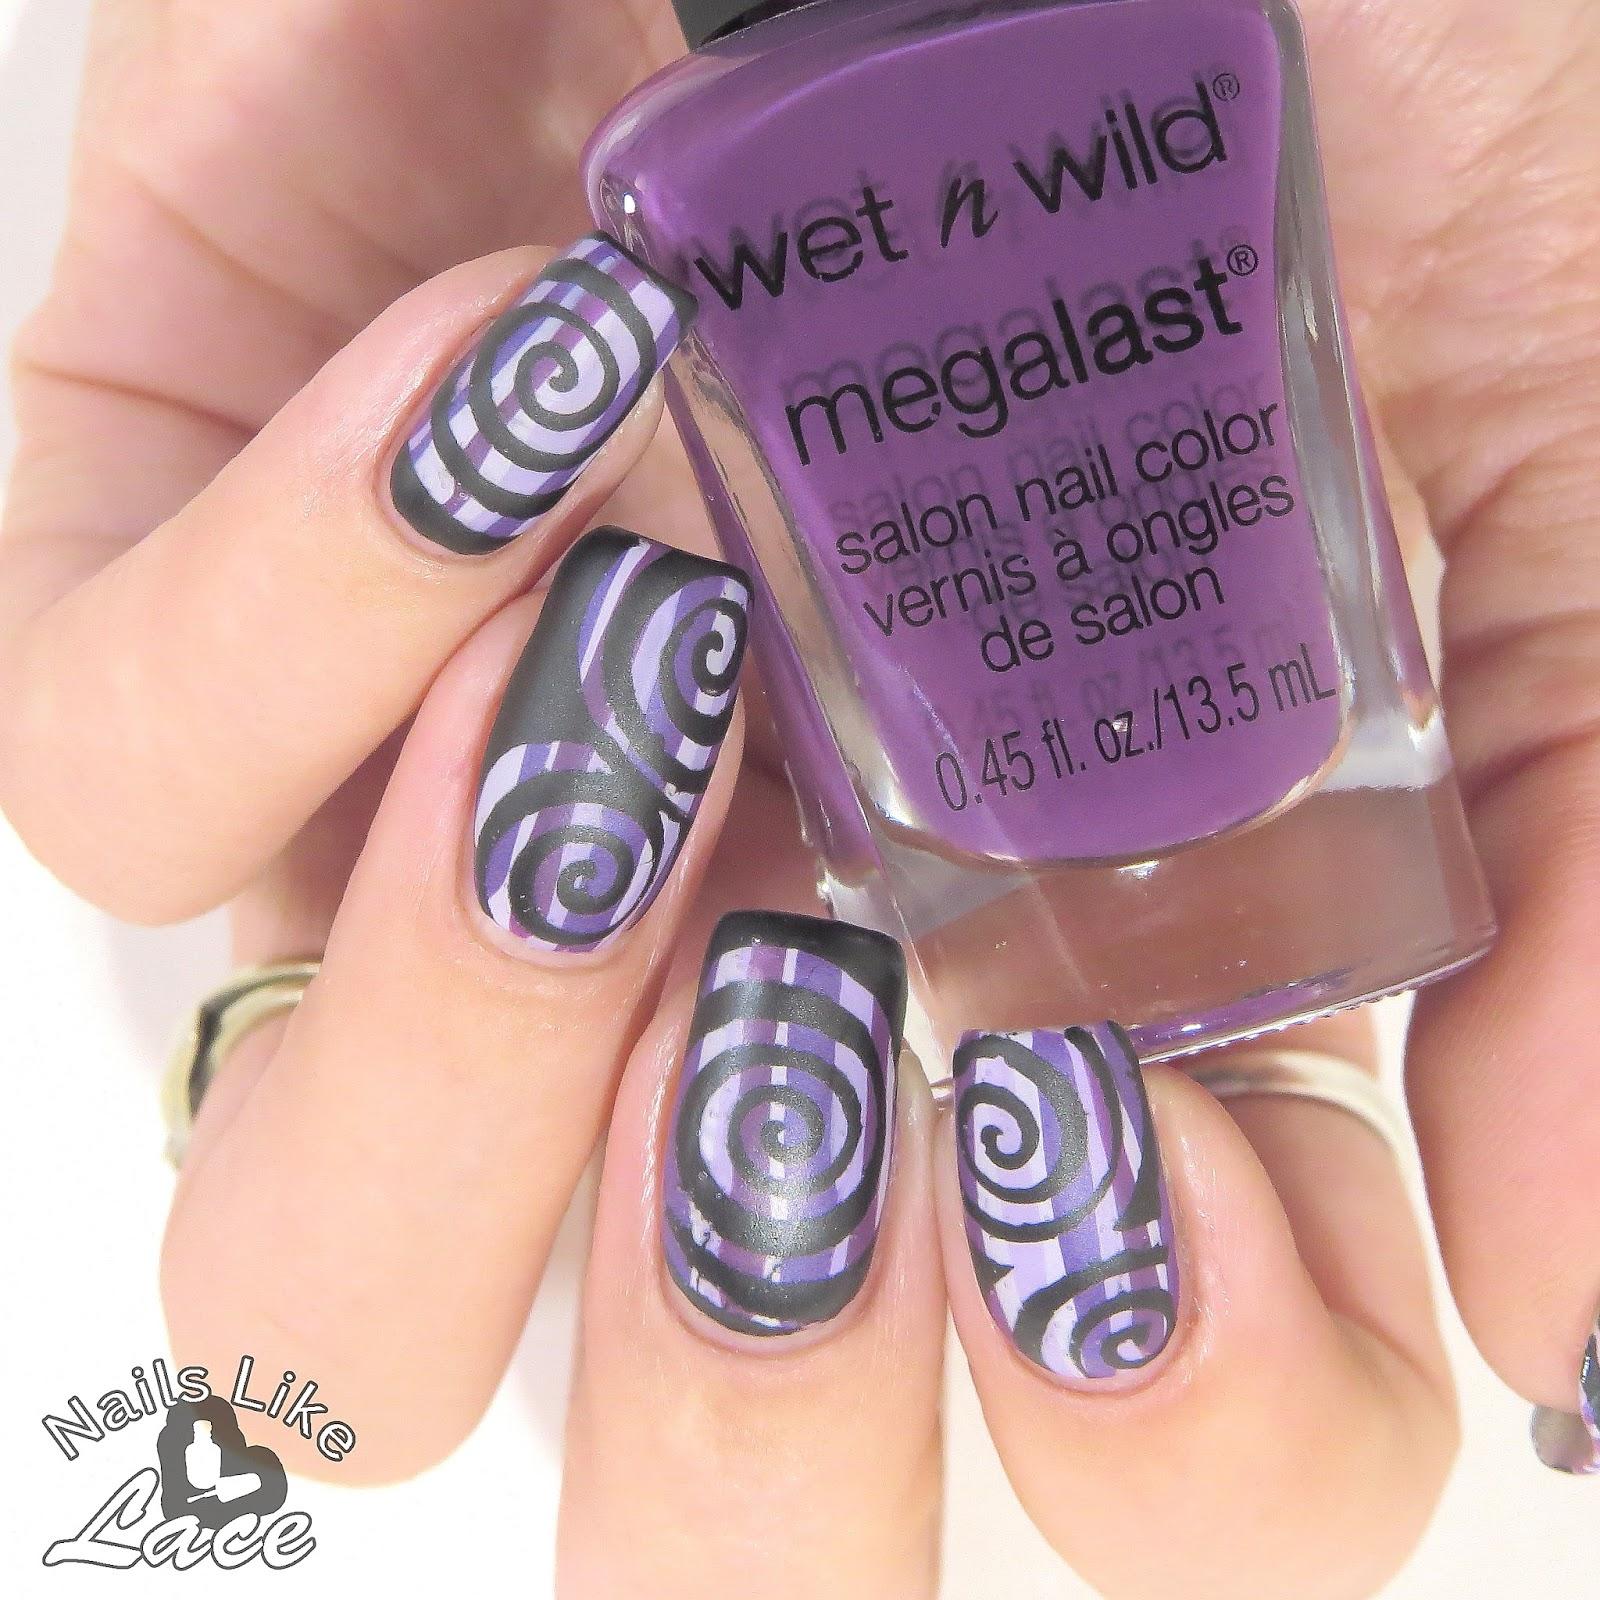 NailsLikeLace: 40 Great Nail Art Ideas: Three Shades of Purple - Swirls